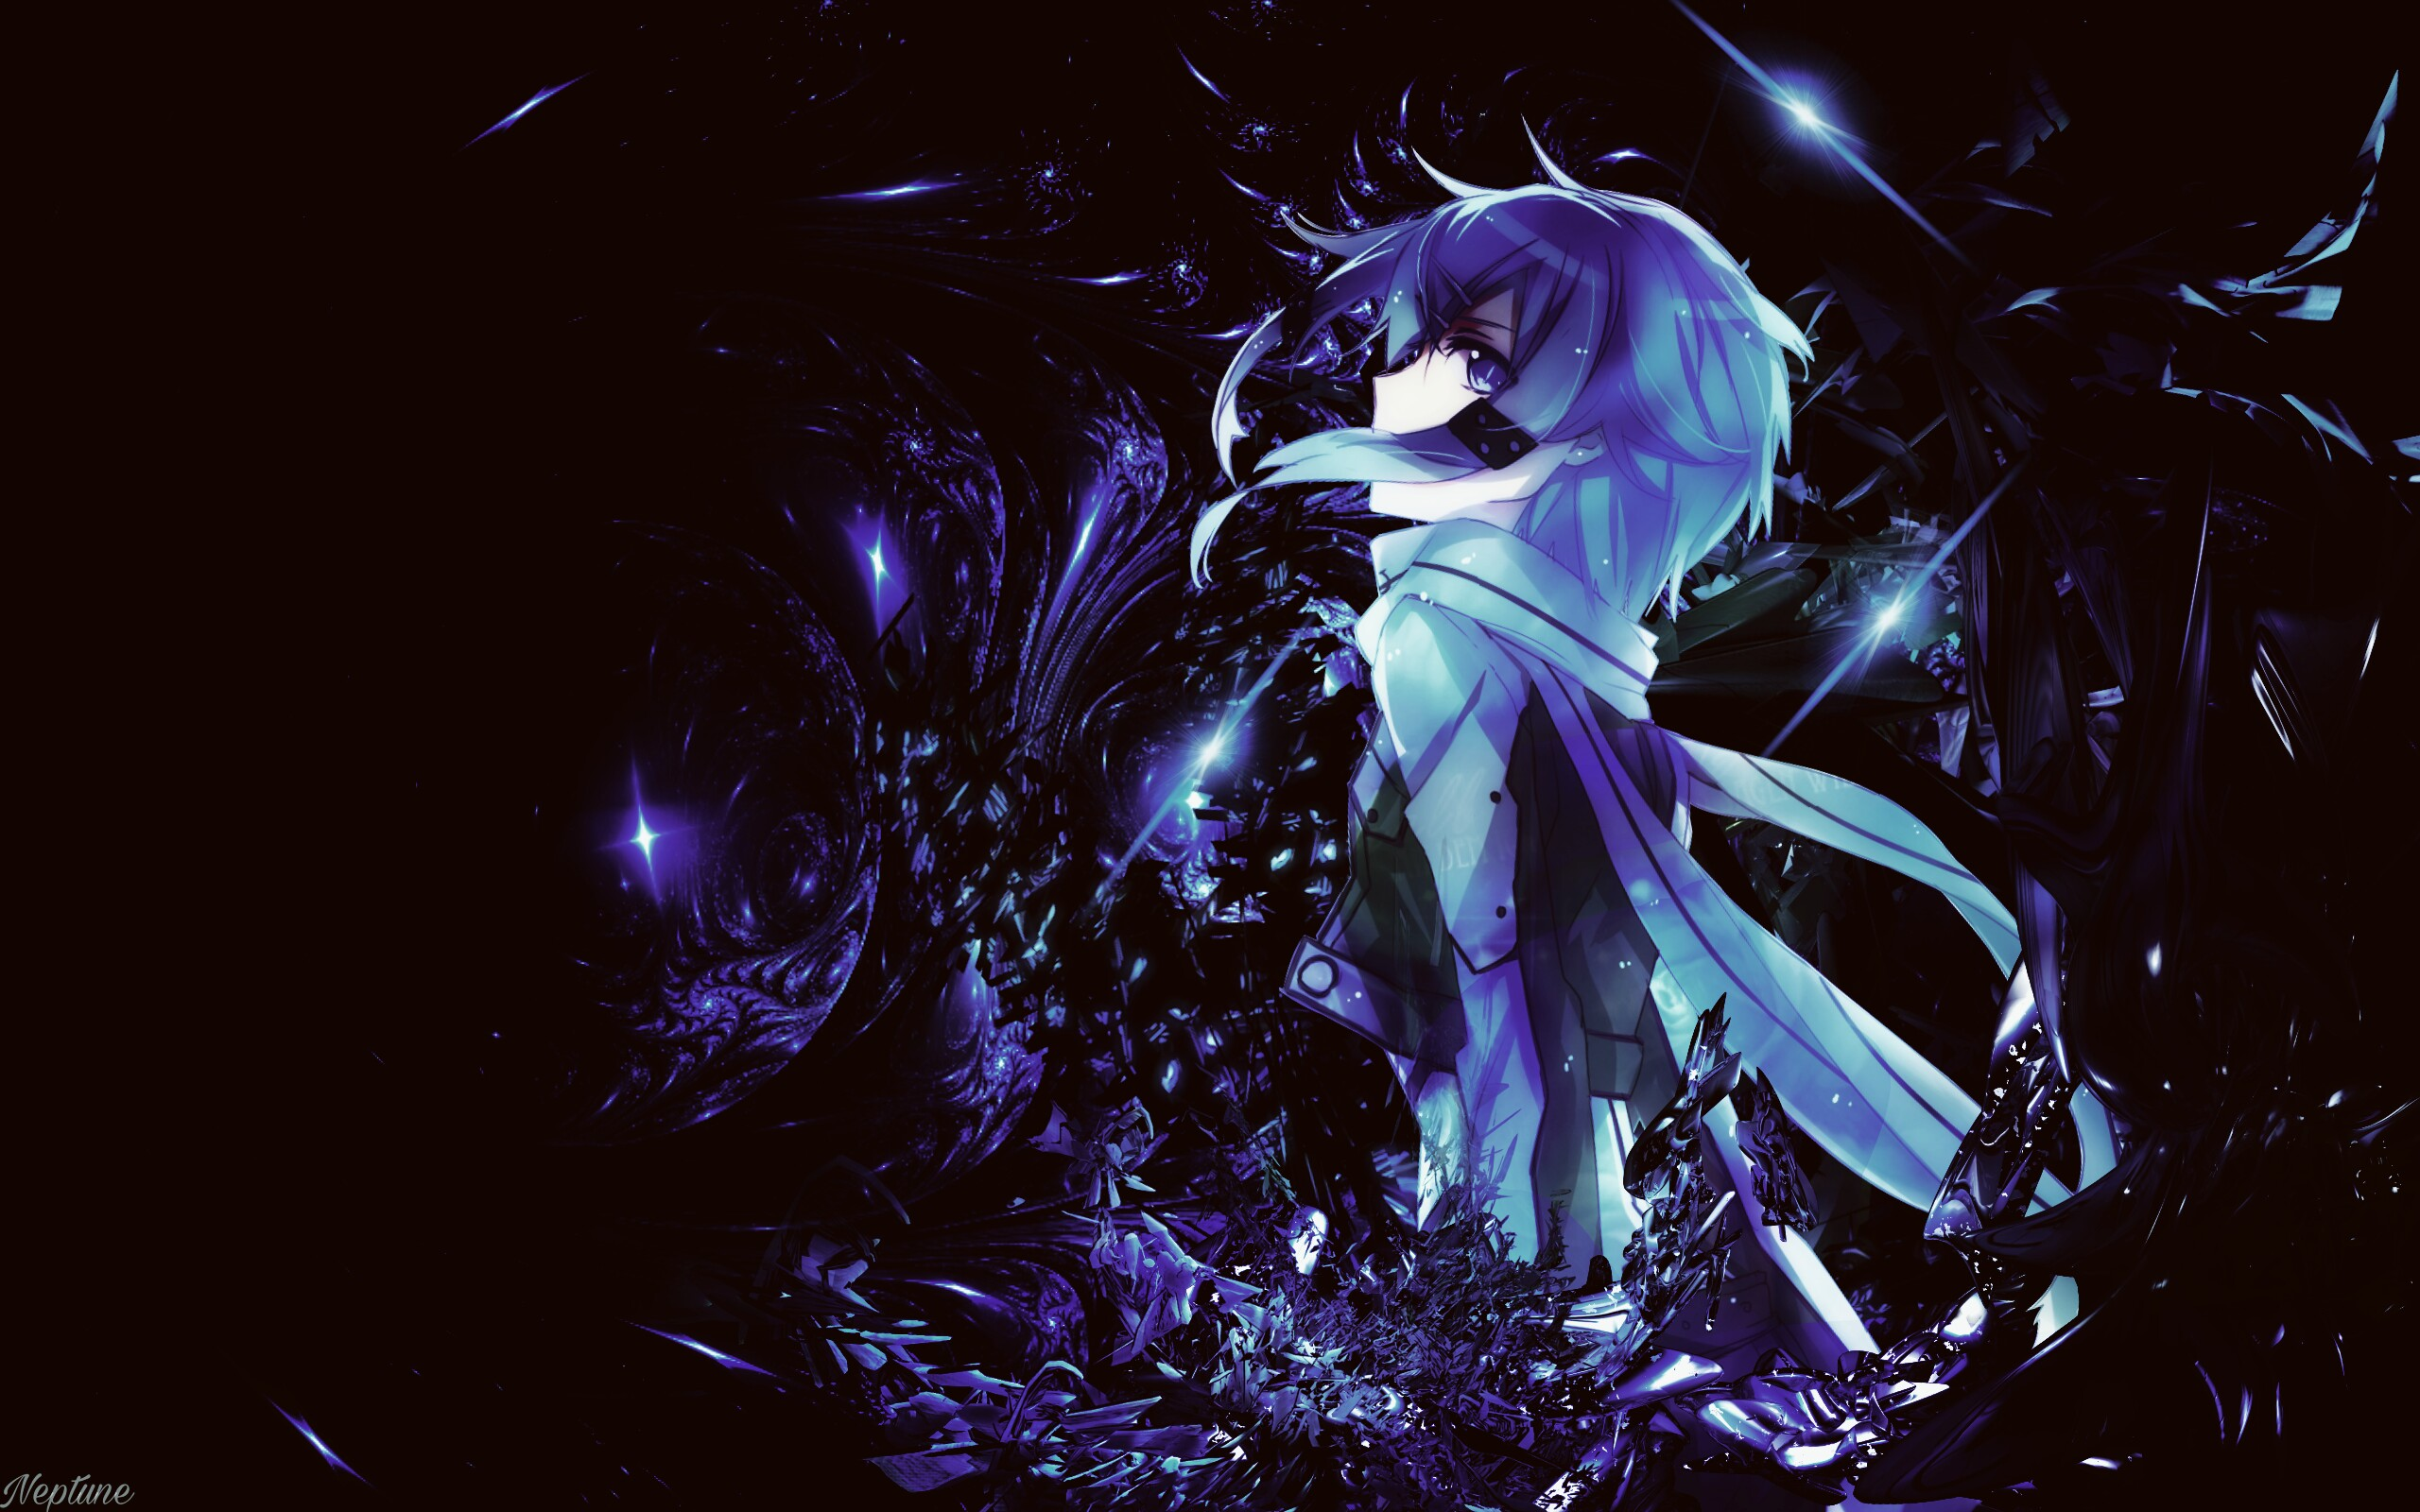 sword art online ii full hd wallpaper and background image